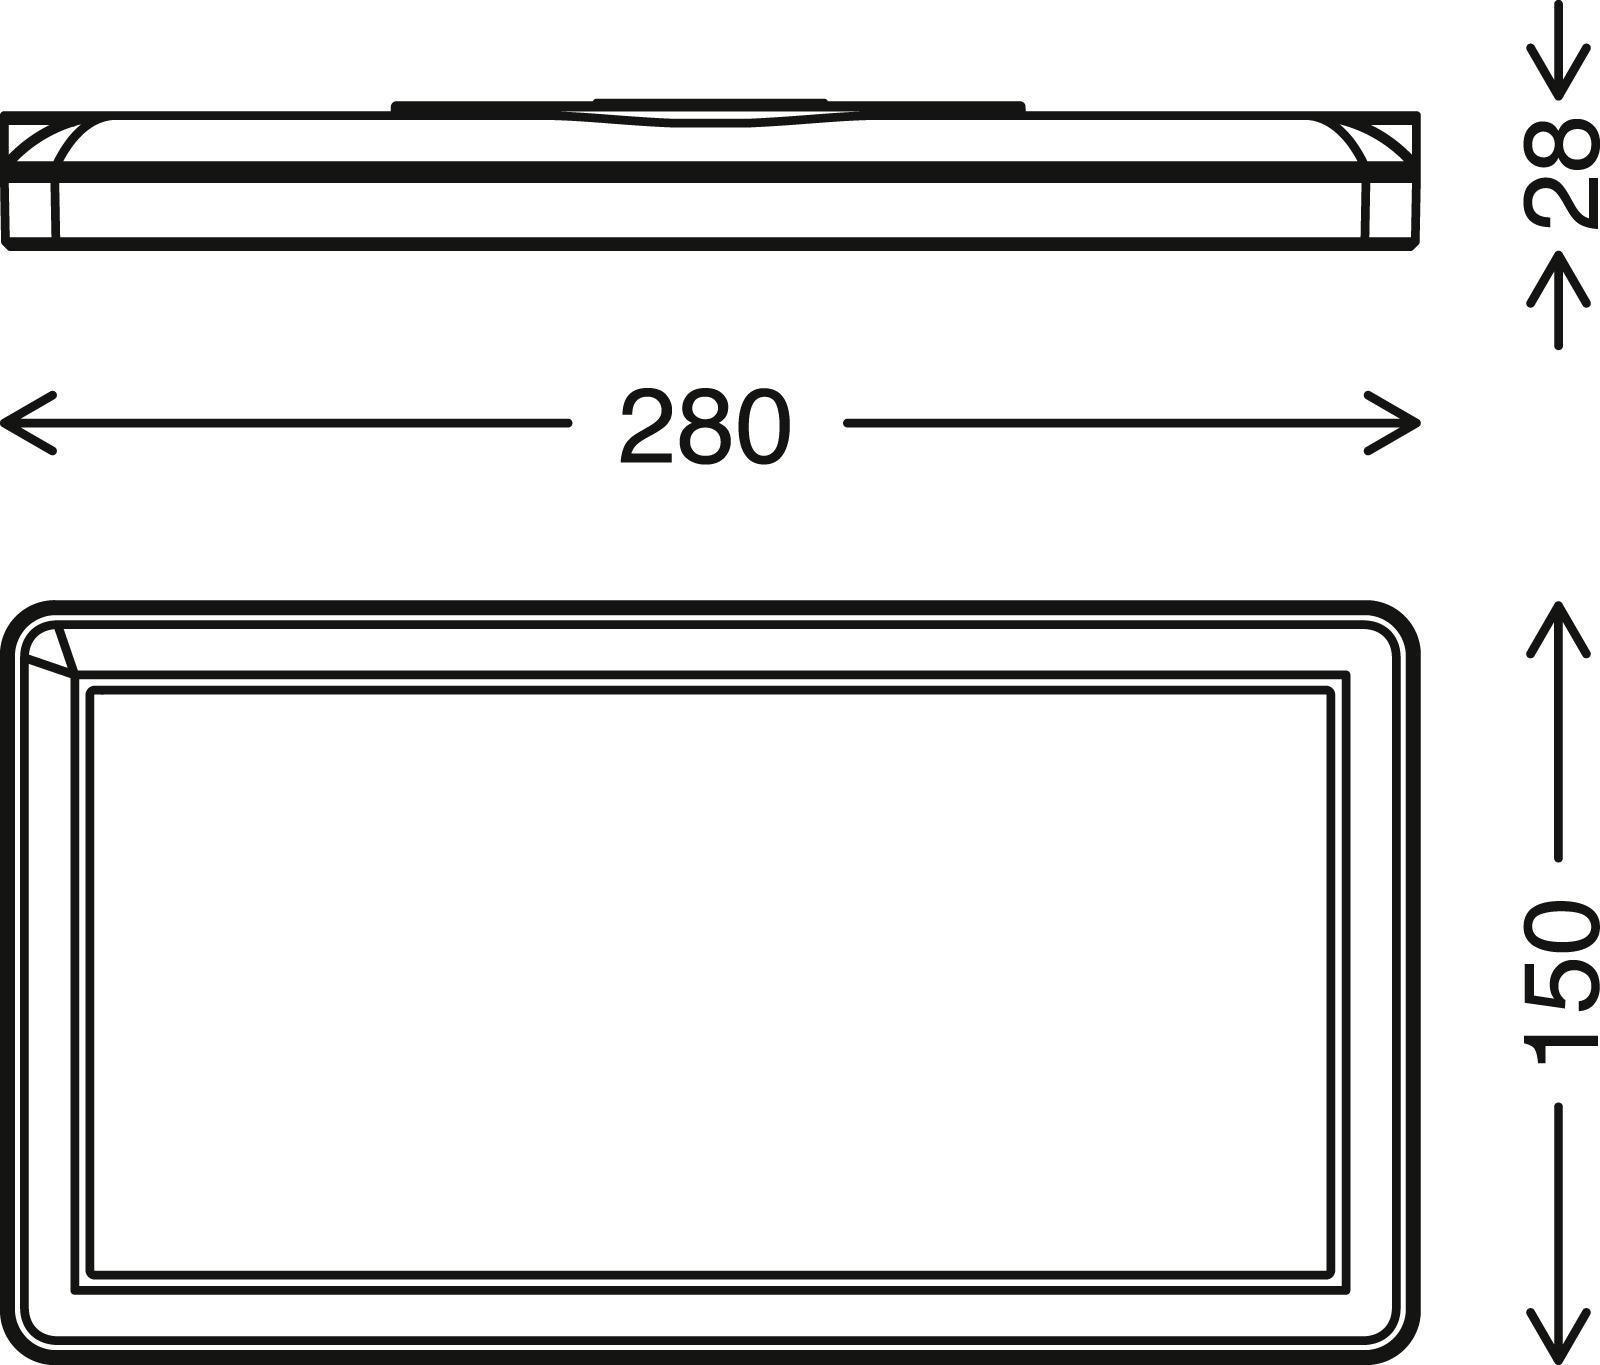 TELEFUNKEN LED Aussenwandleuchte, 28 cm, 16 W, Schwarz